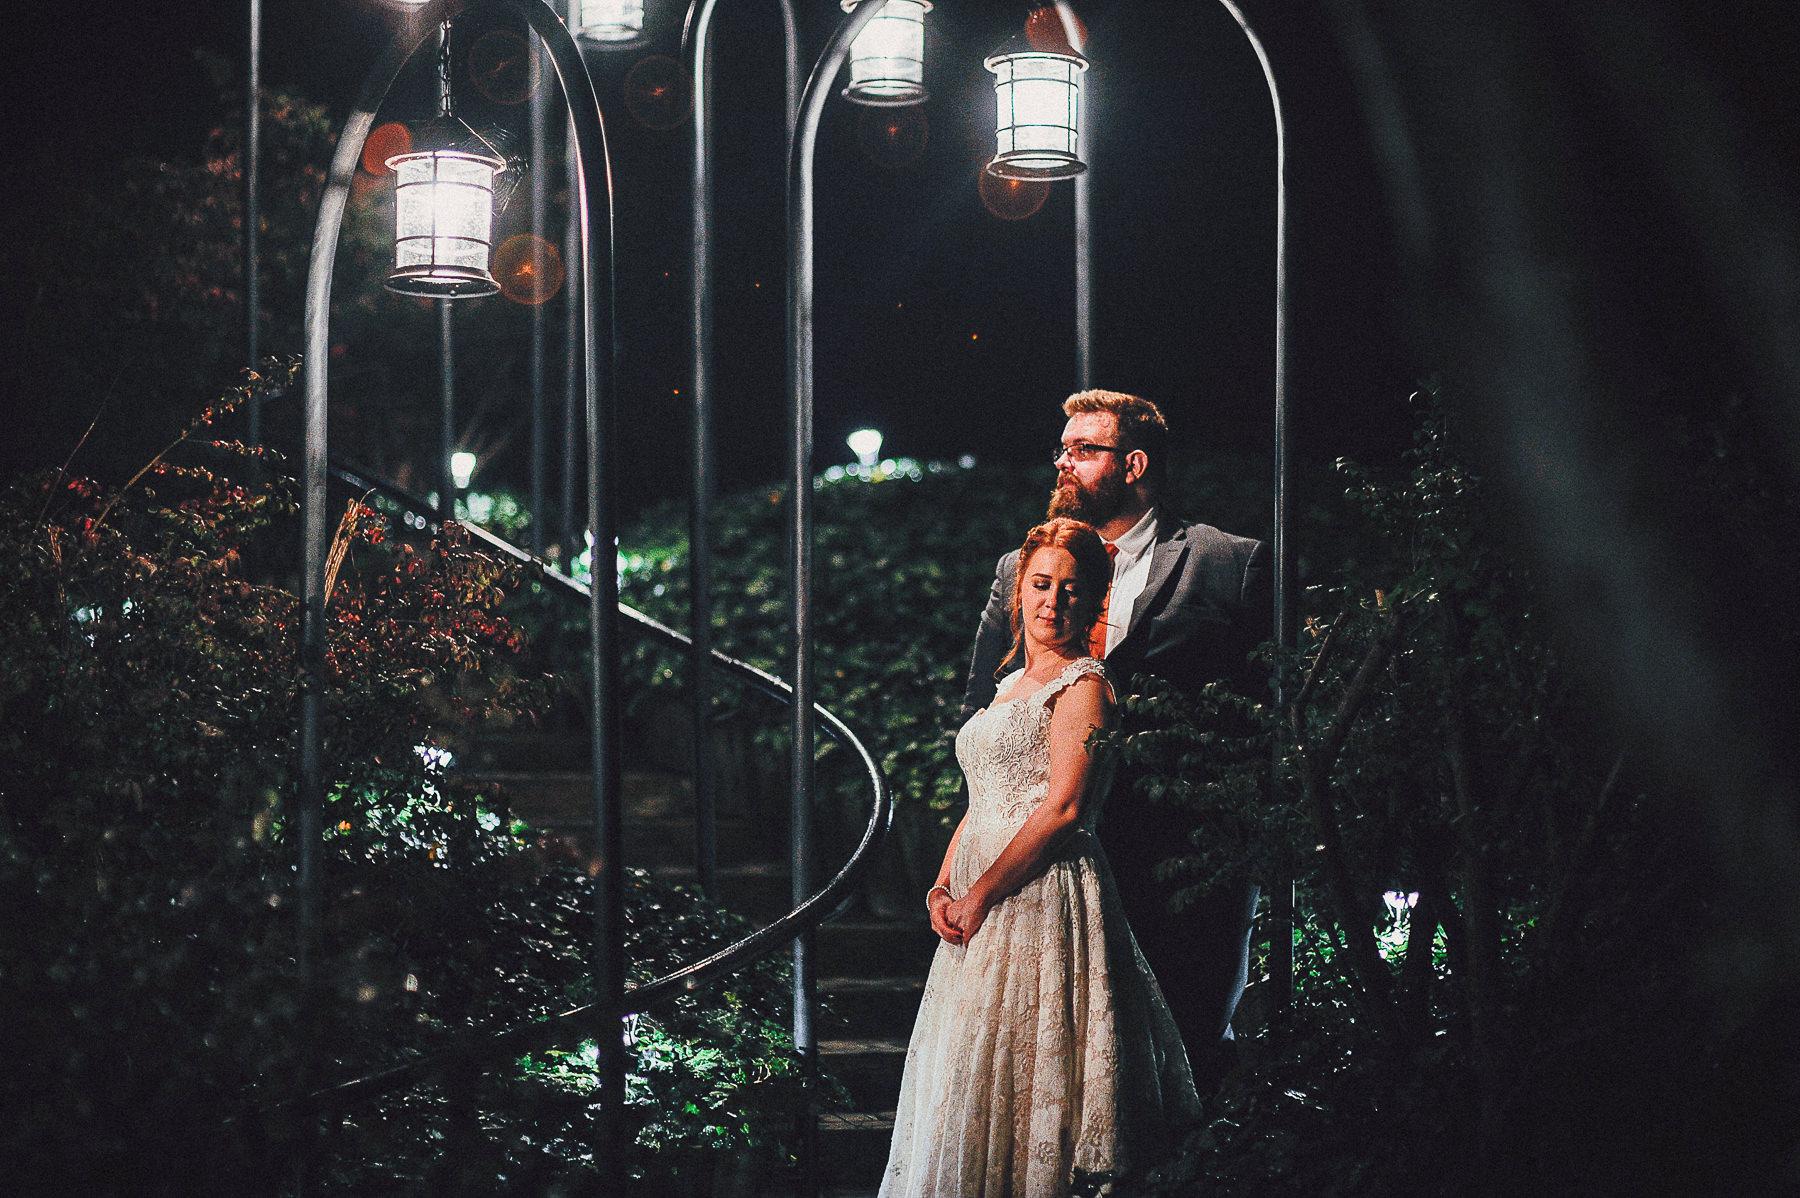 breighton-and-basette-photography-copyrighted-image-blog-amanda-and-eric-wedding-title-photo.jpg